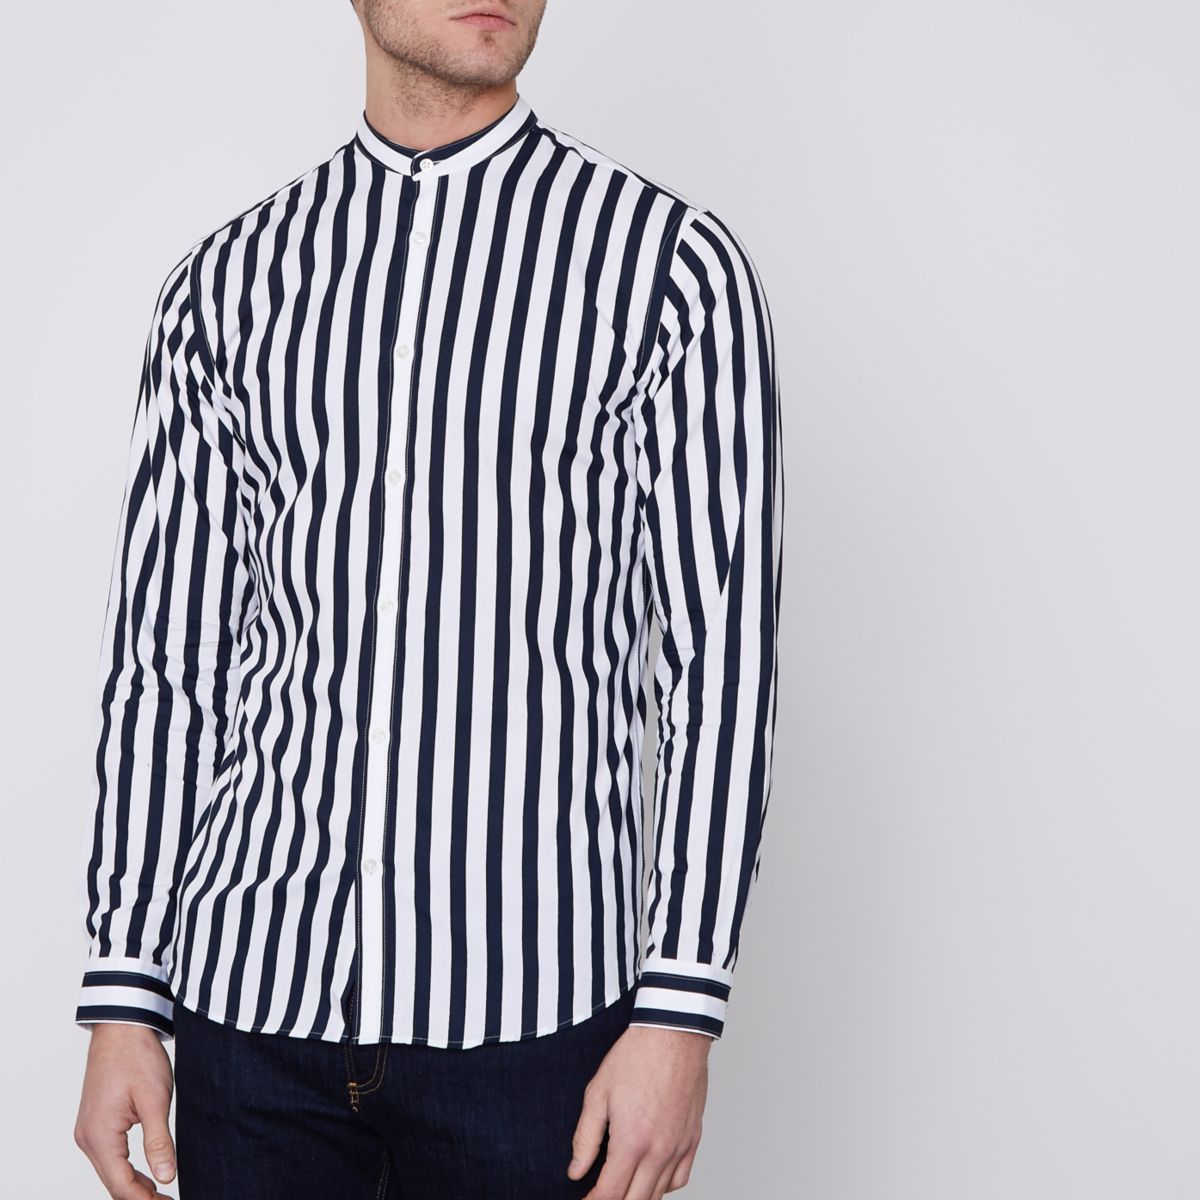 Navy Jack & Jones Premium stripe shirt